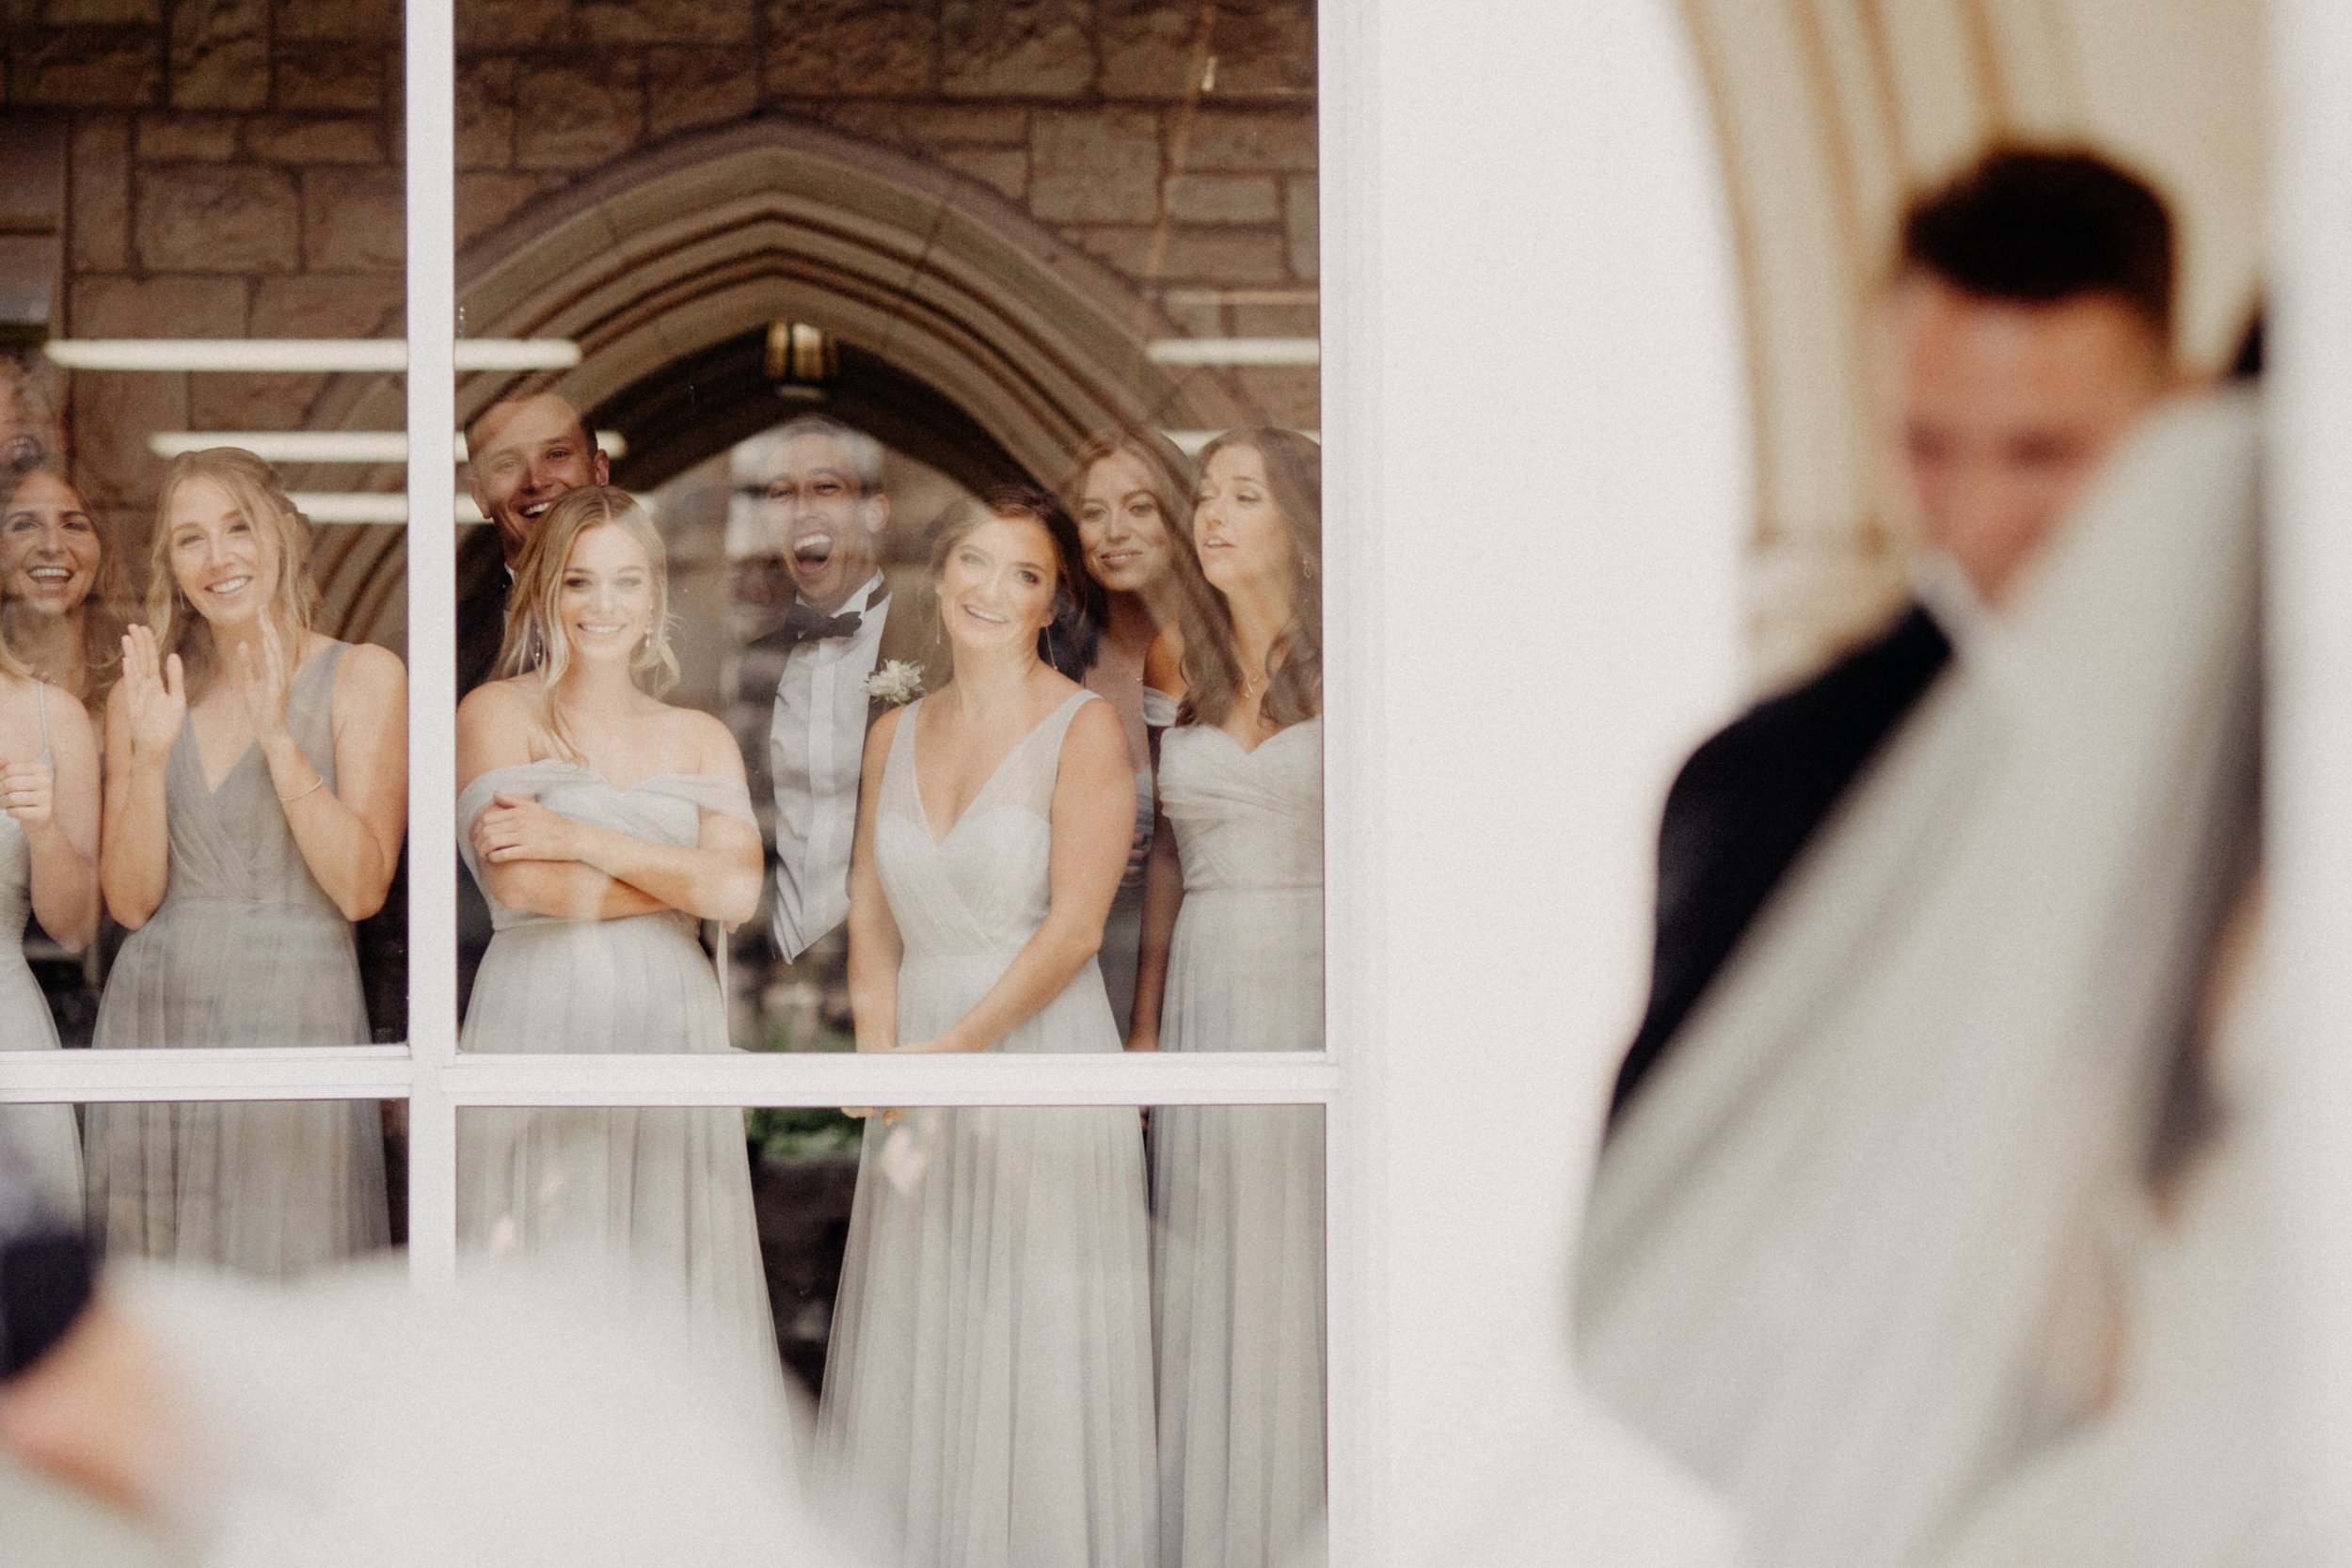 st-anthony-hotel-wedding-photography-10054san-antonio.JPG